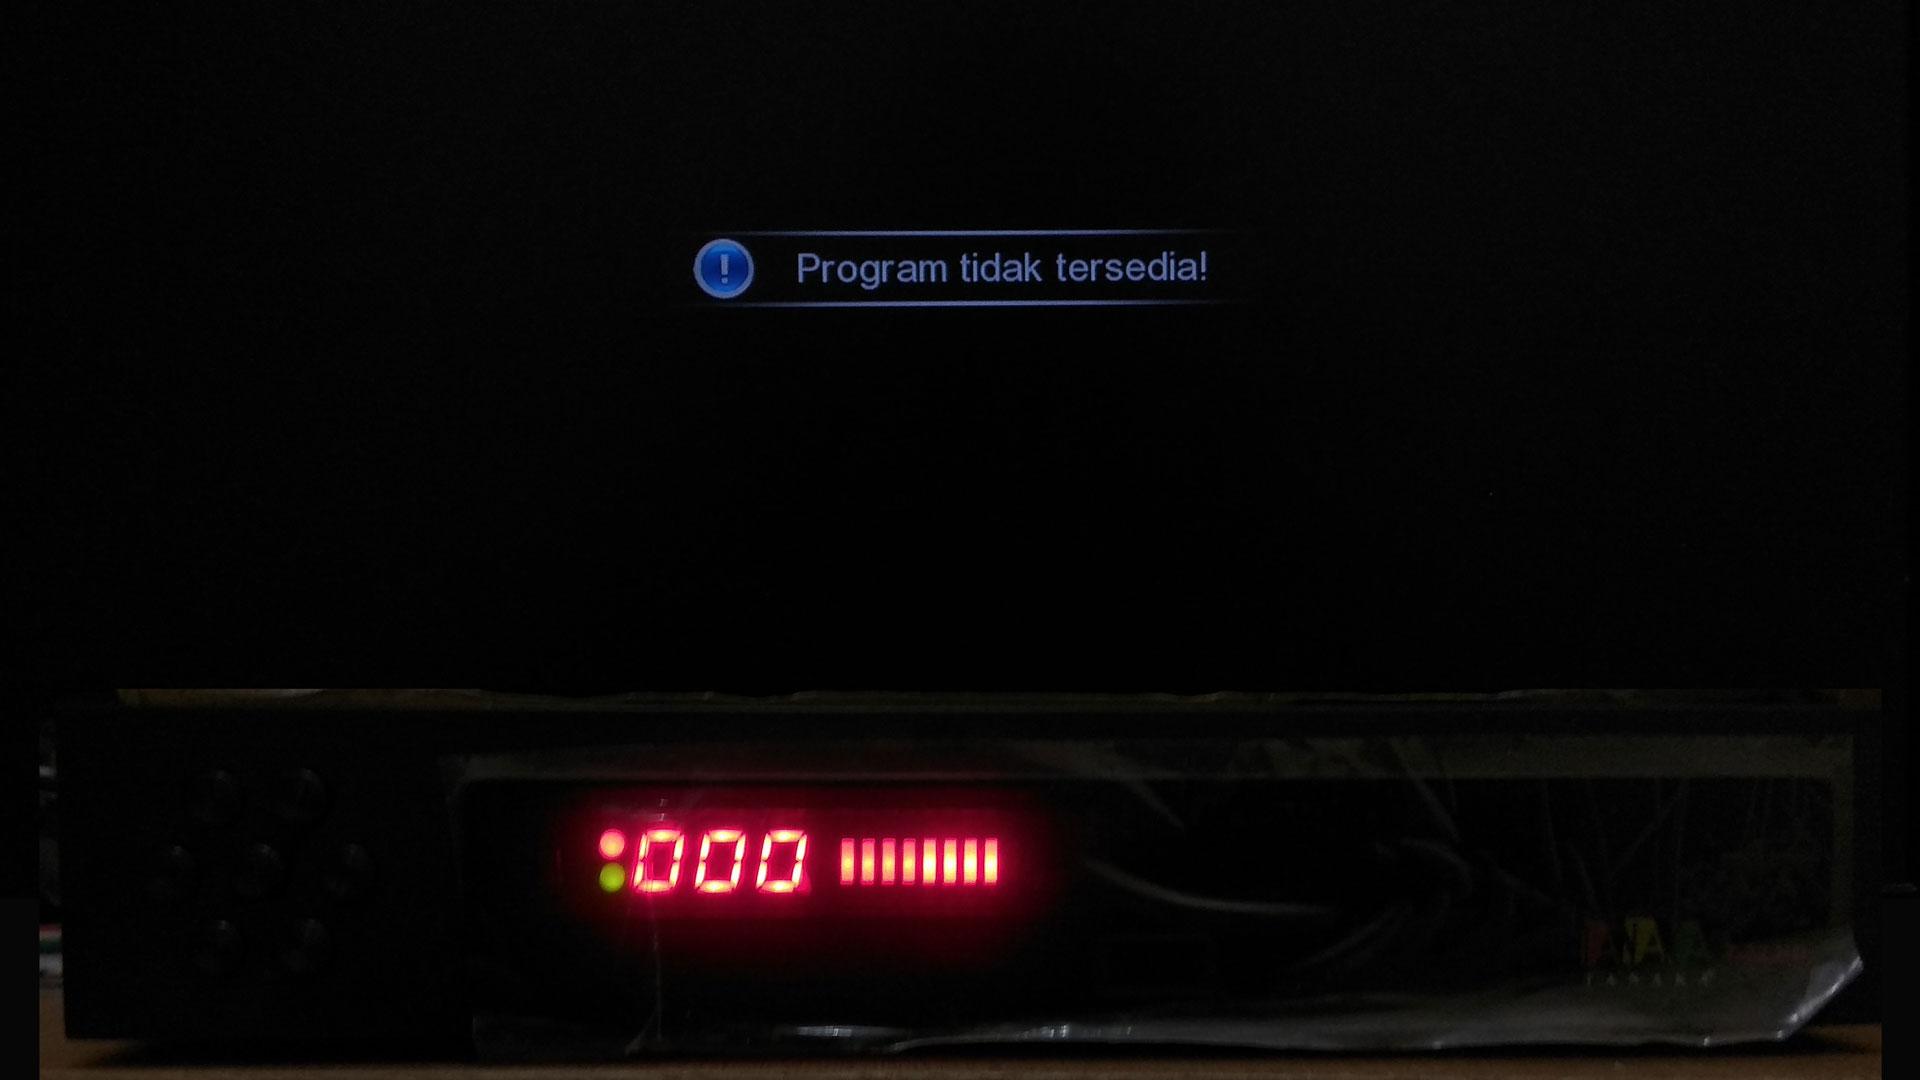 Cara Memperbaiki Tanaka Topas TV Program Tidak Tersedia